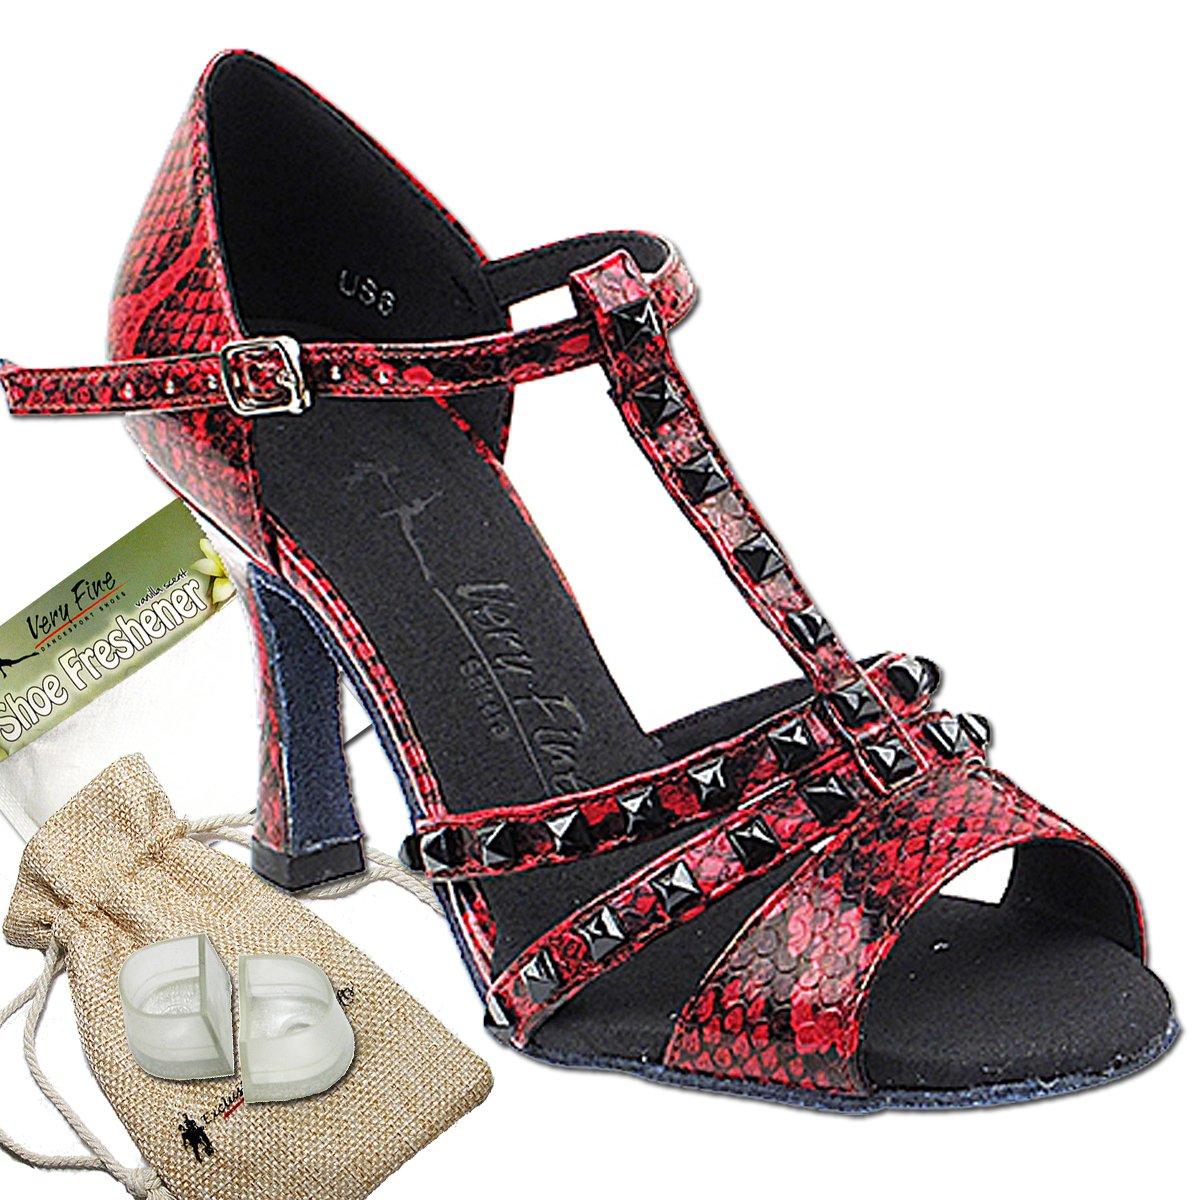 Women's Ballroom Dance Shoes Tango Wedding Salsa Dance Shoes Red Snake Sera7012EB Comfortable - Very Fine 3'' Heel 7.5 M US [Bundle 5]